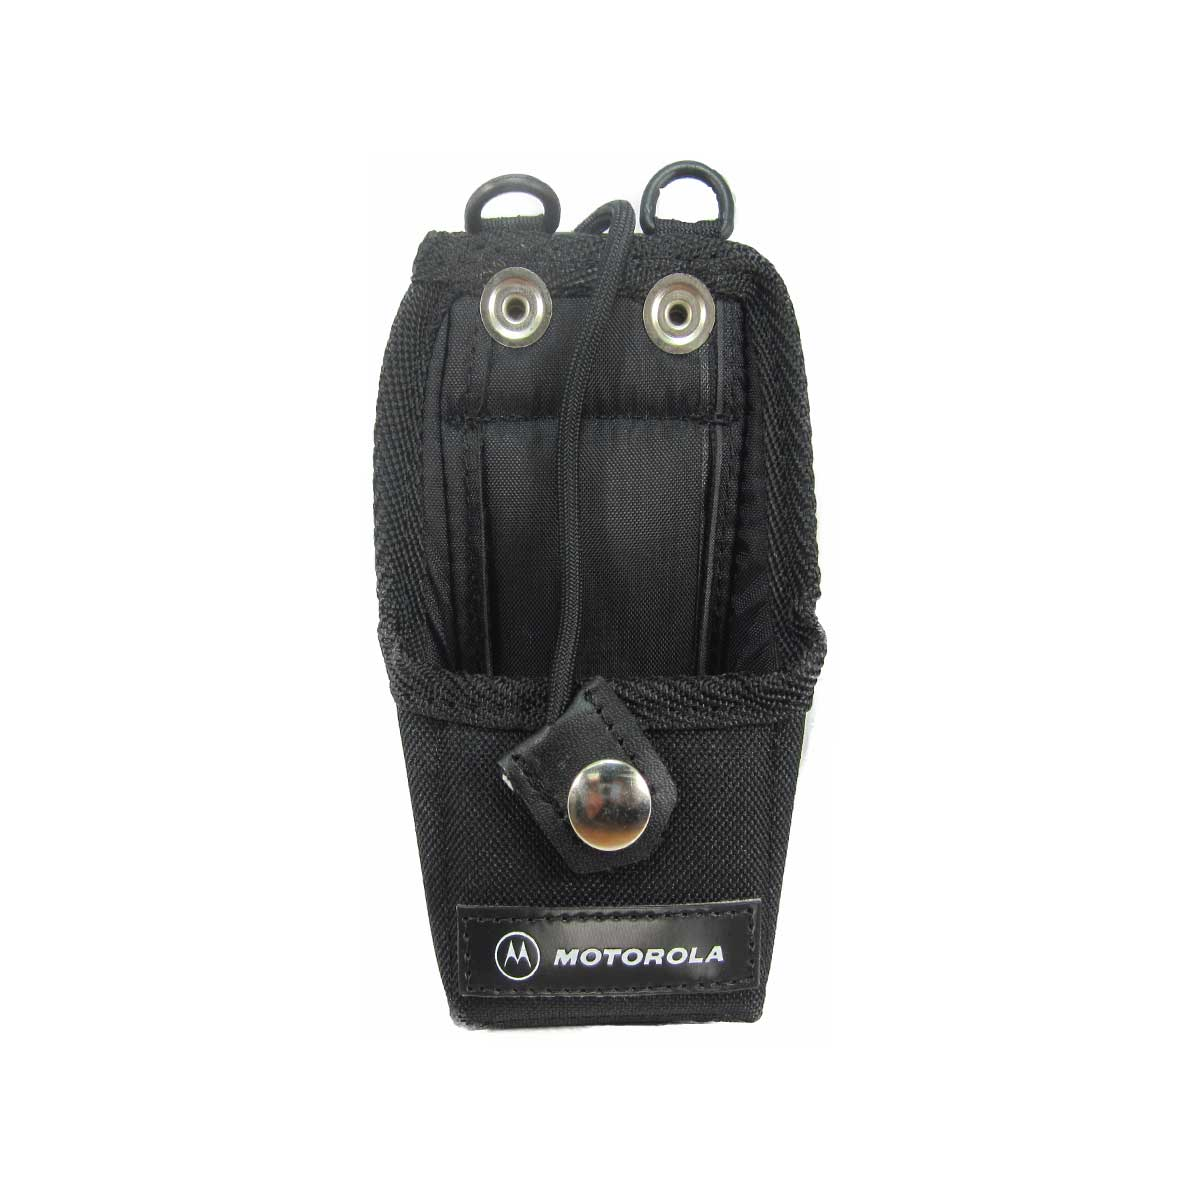 Estuche Motorola  HLN9701 de nylon